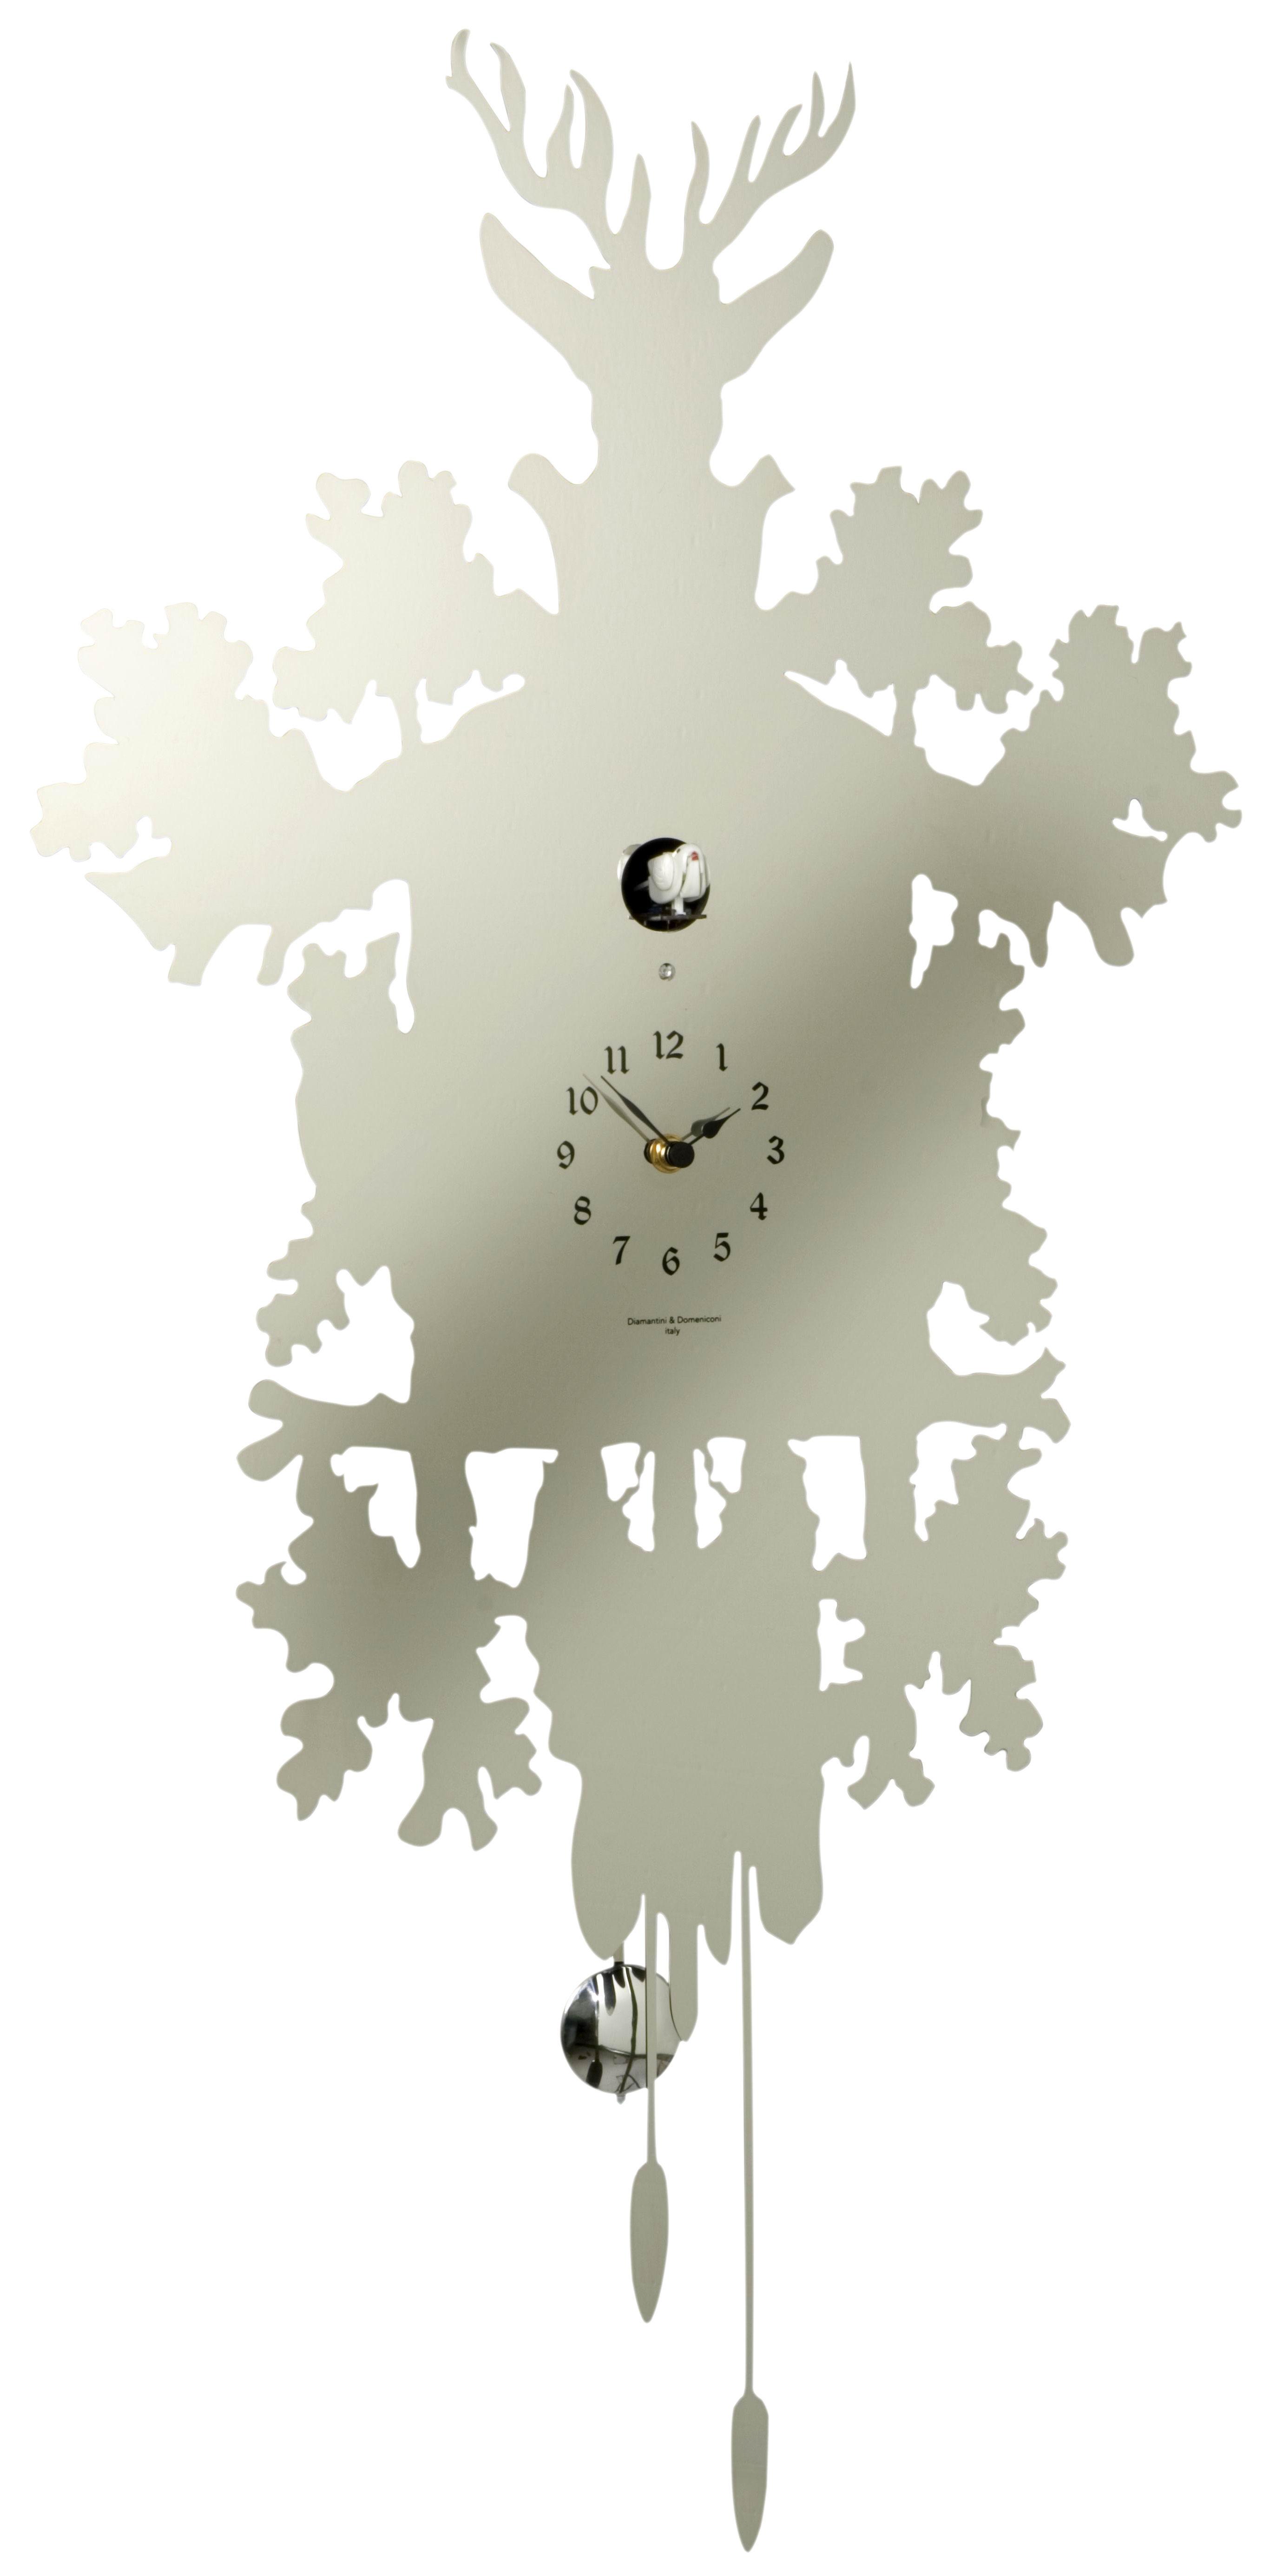 Horloge murale Cucù / Avec balancier - H 81 cm Acier inox ...